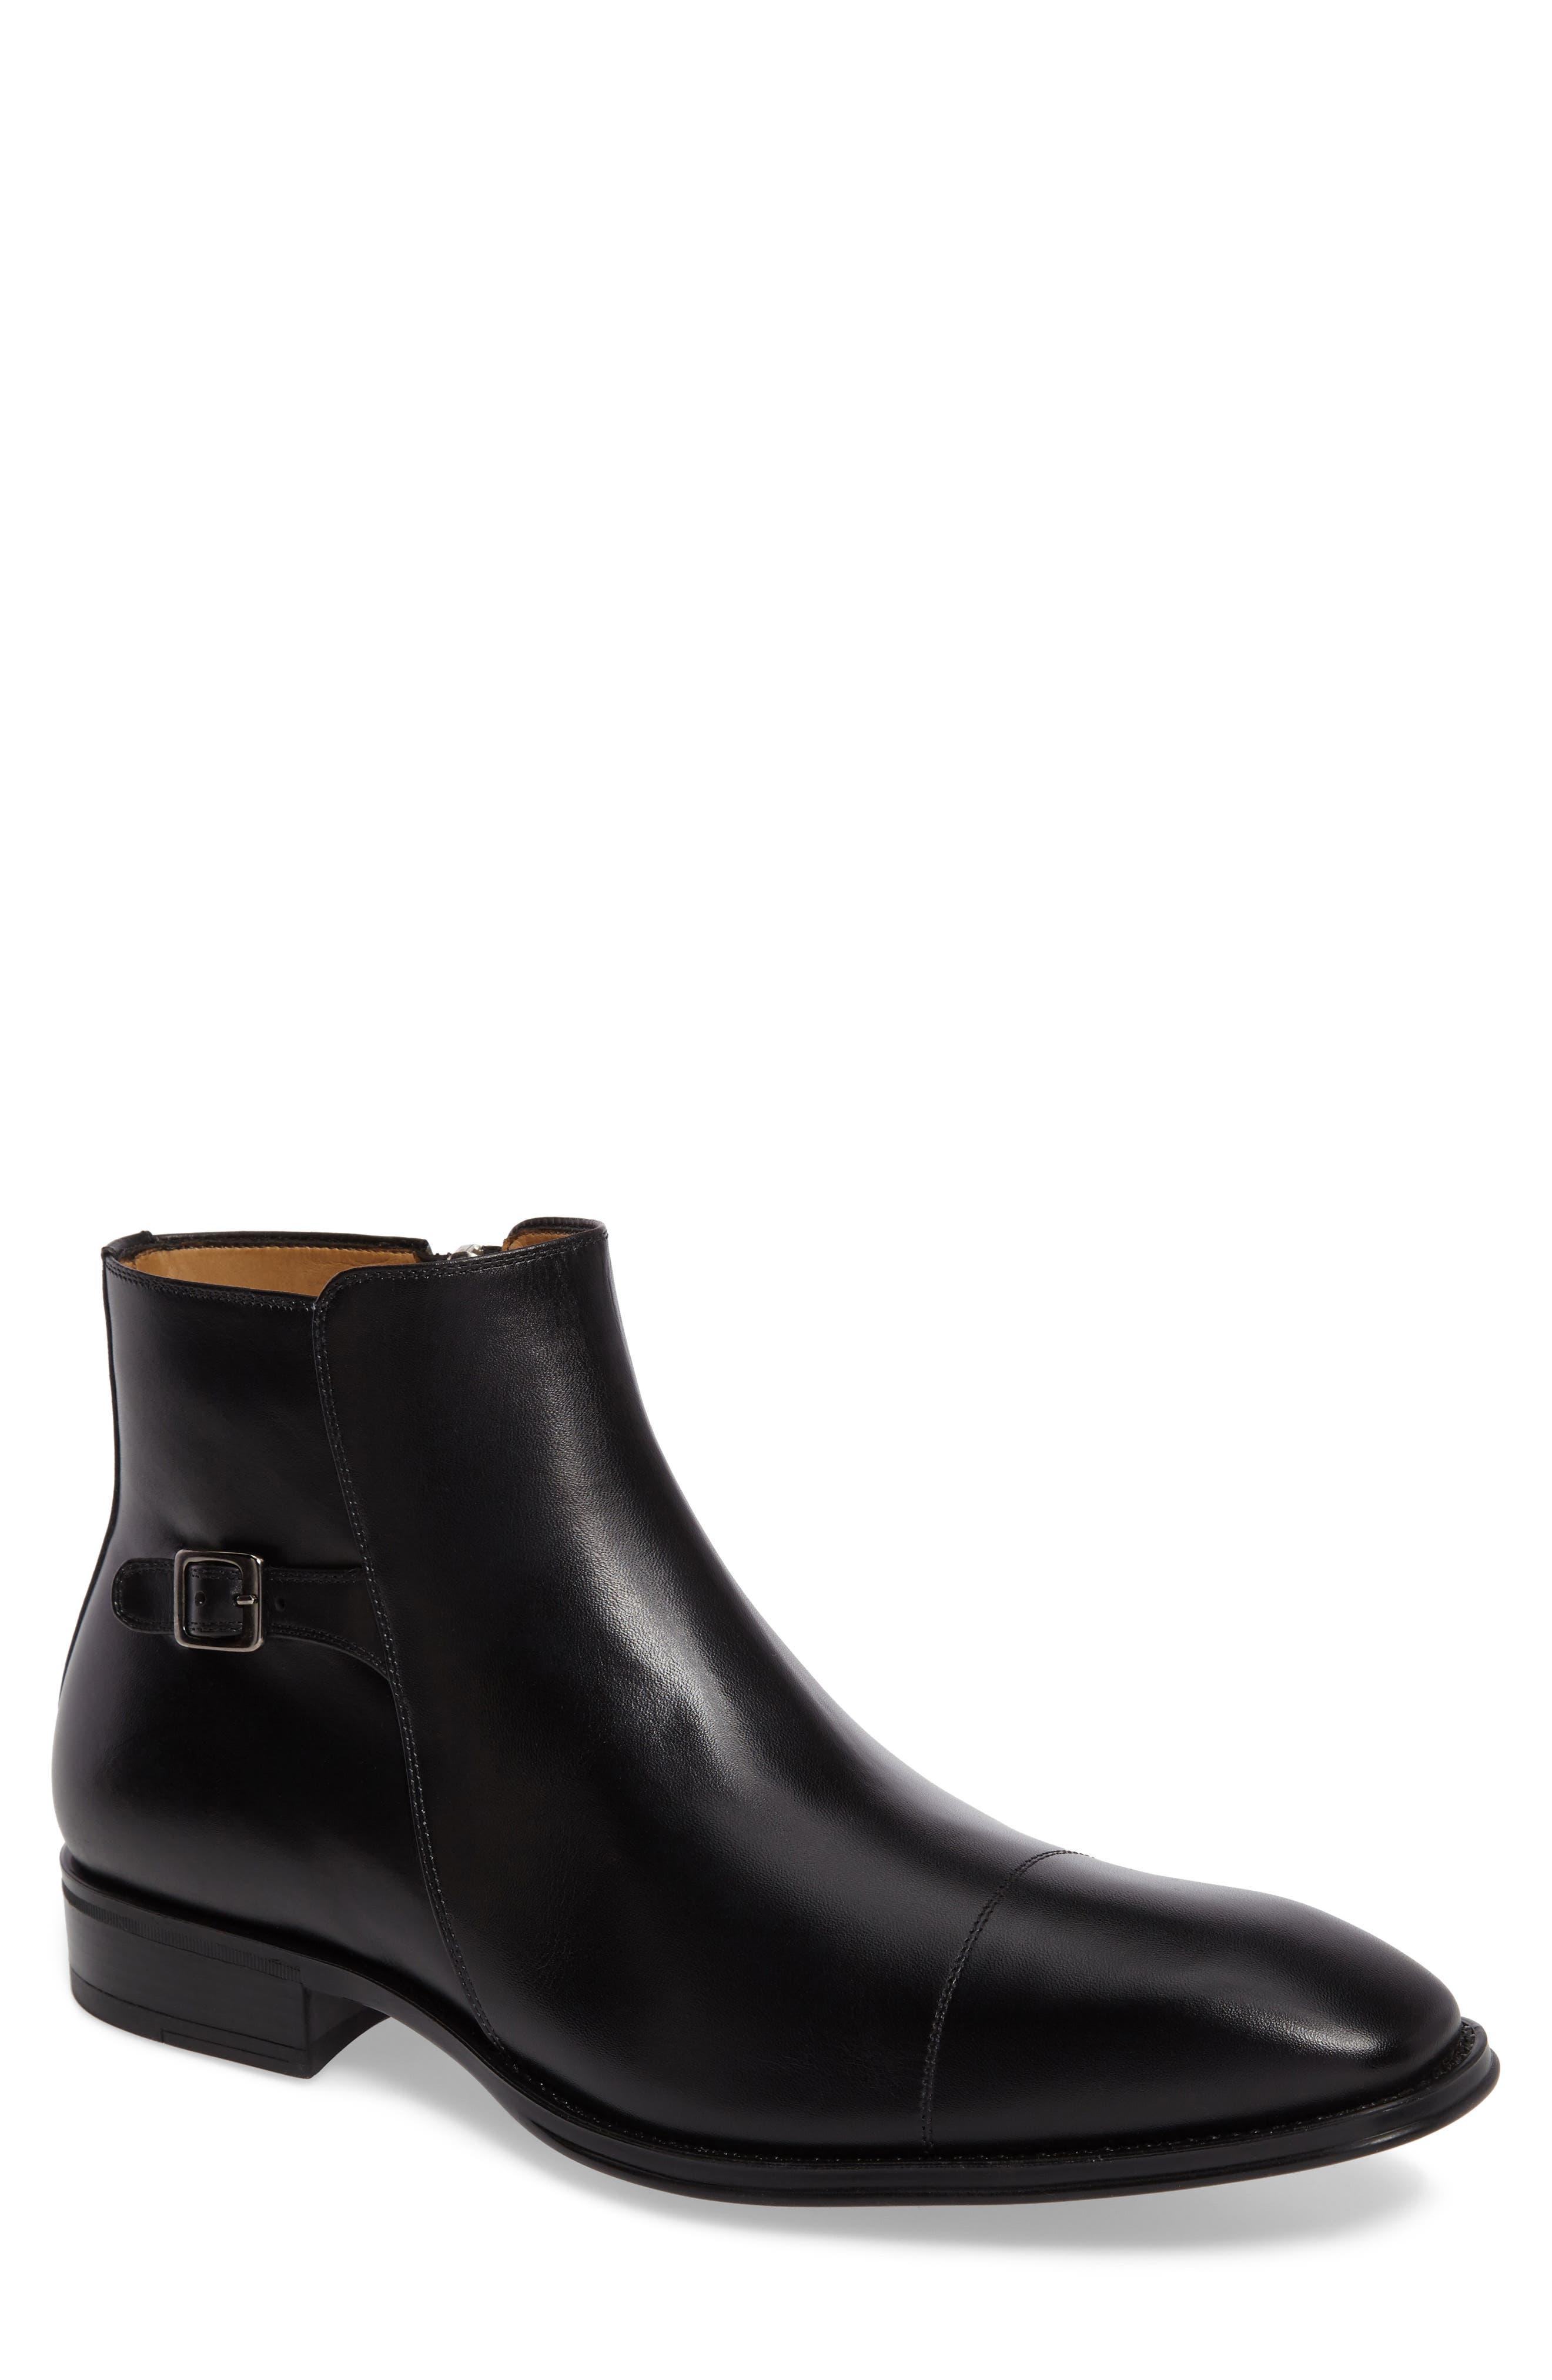 Casares II Zip Boot,                             Main thumbnail 1, color,                             Black